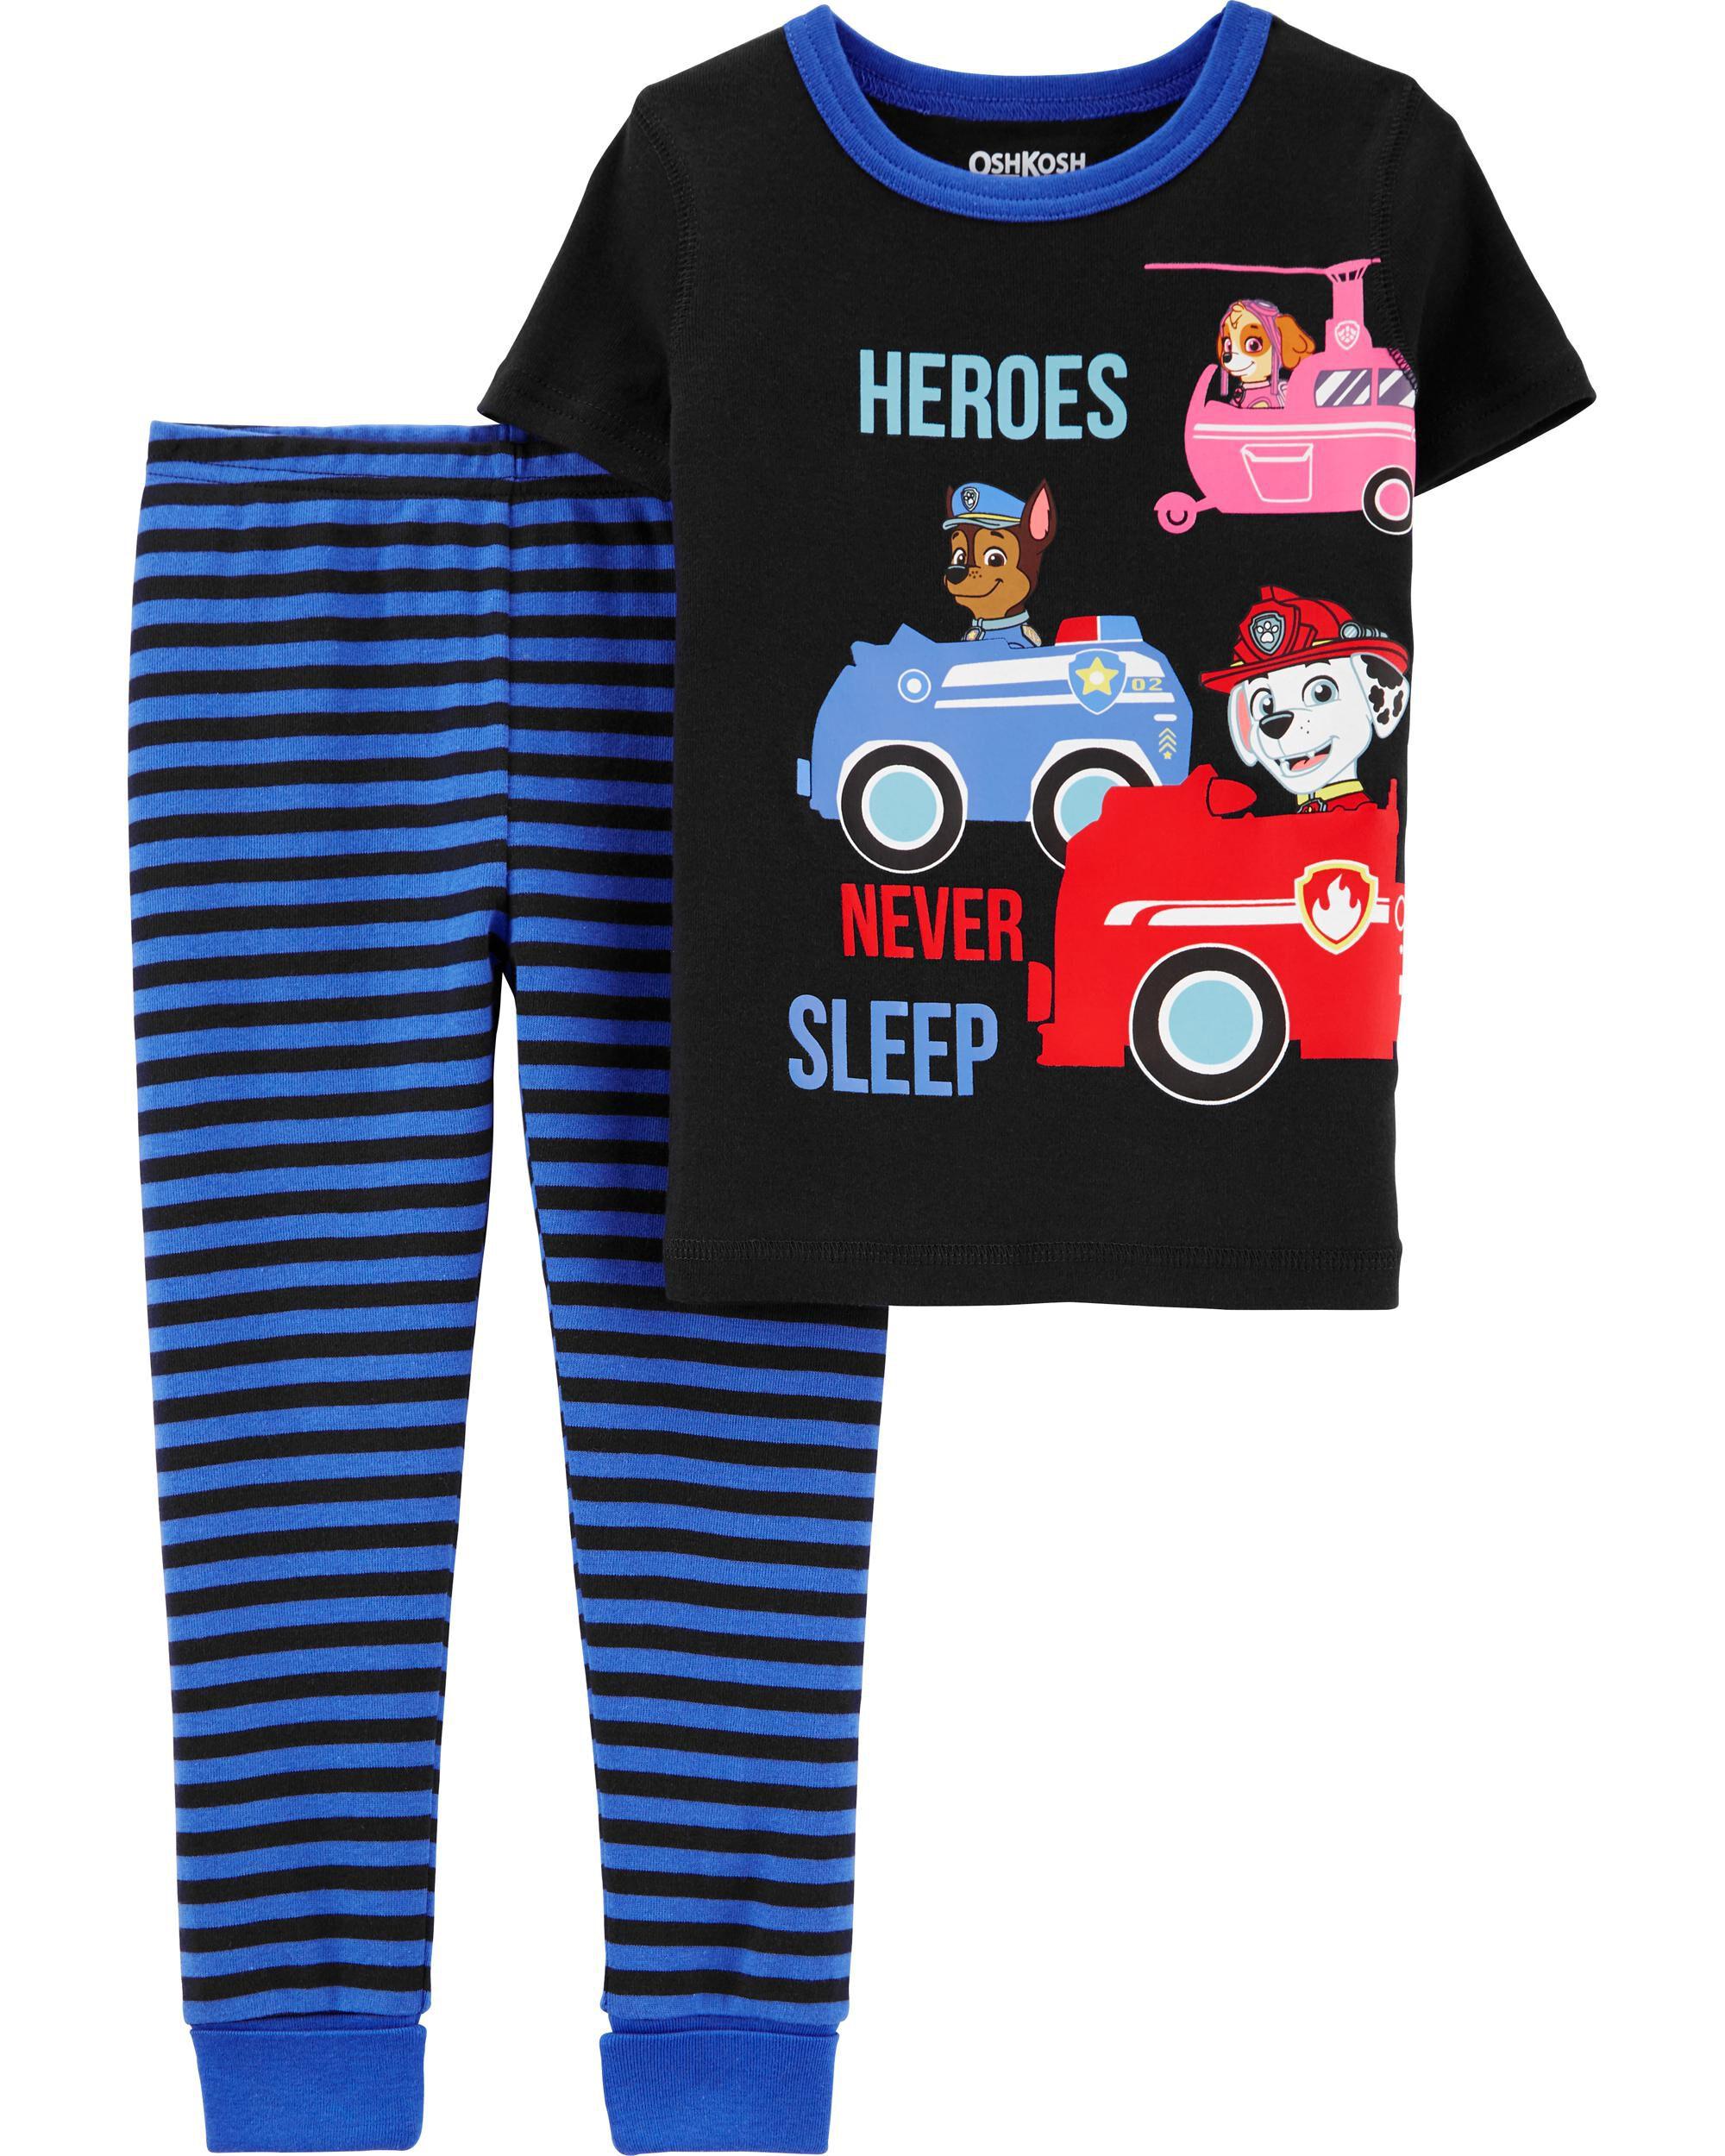 Carters Girls 4T 4 Piece Long Pants Bunny Hop To Bed Pajamas 4T Retail $34!